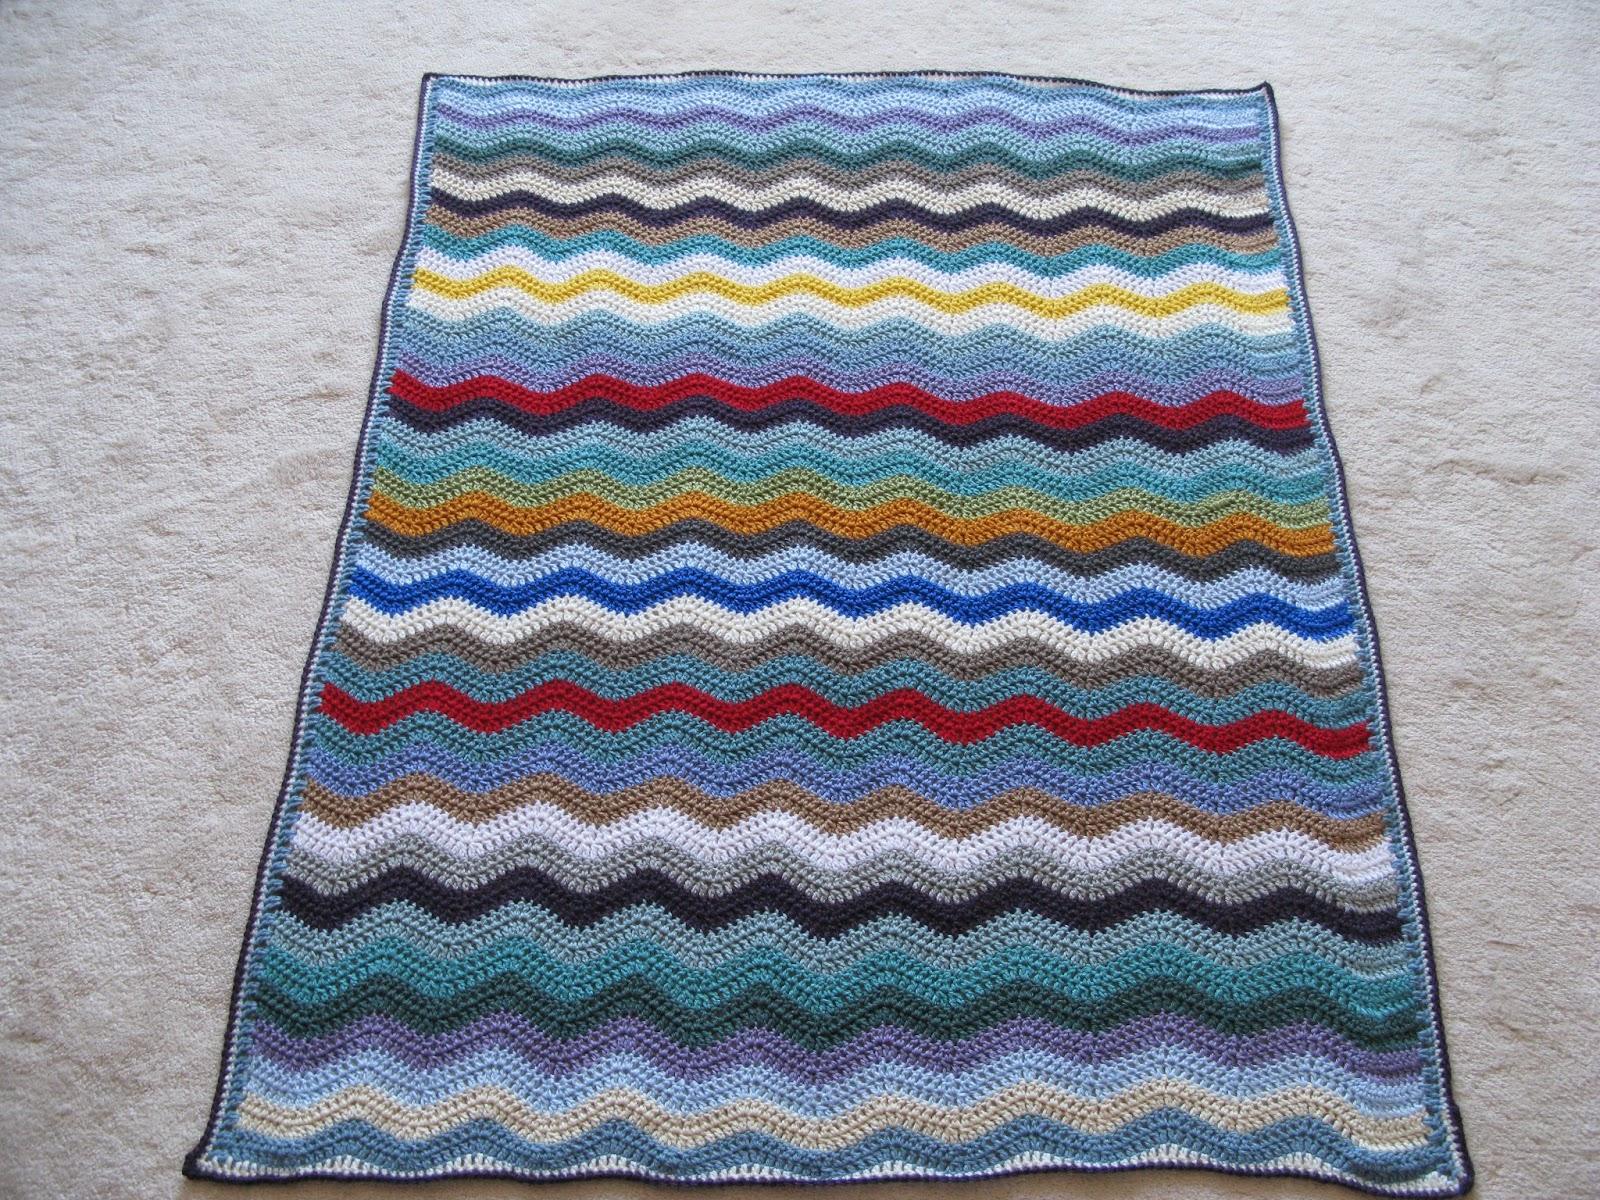 Crochet Baby Blanket Patterns Worsted Weight Yarn : meo my crochet: Stash-Buster Ripple Baby Blanket